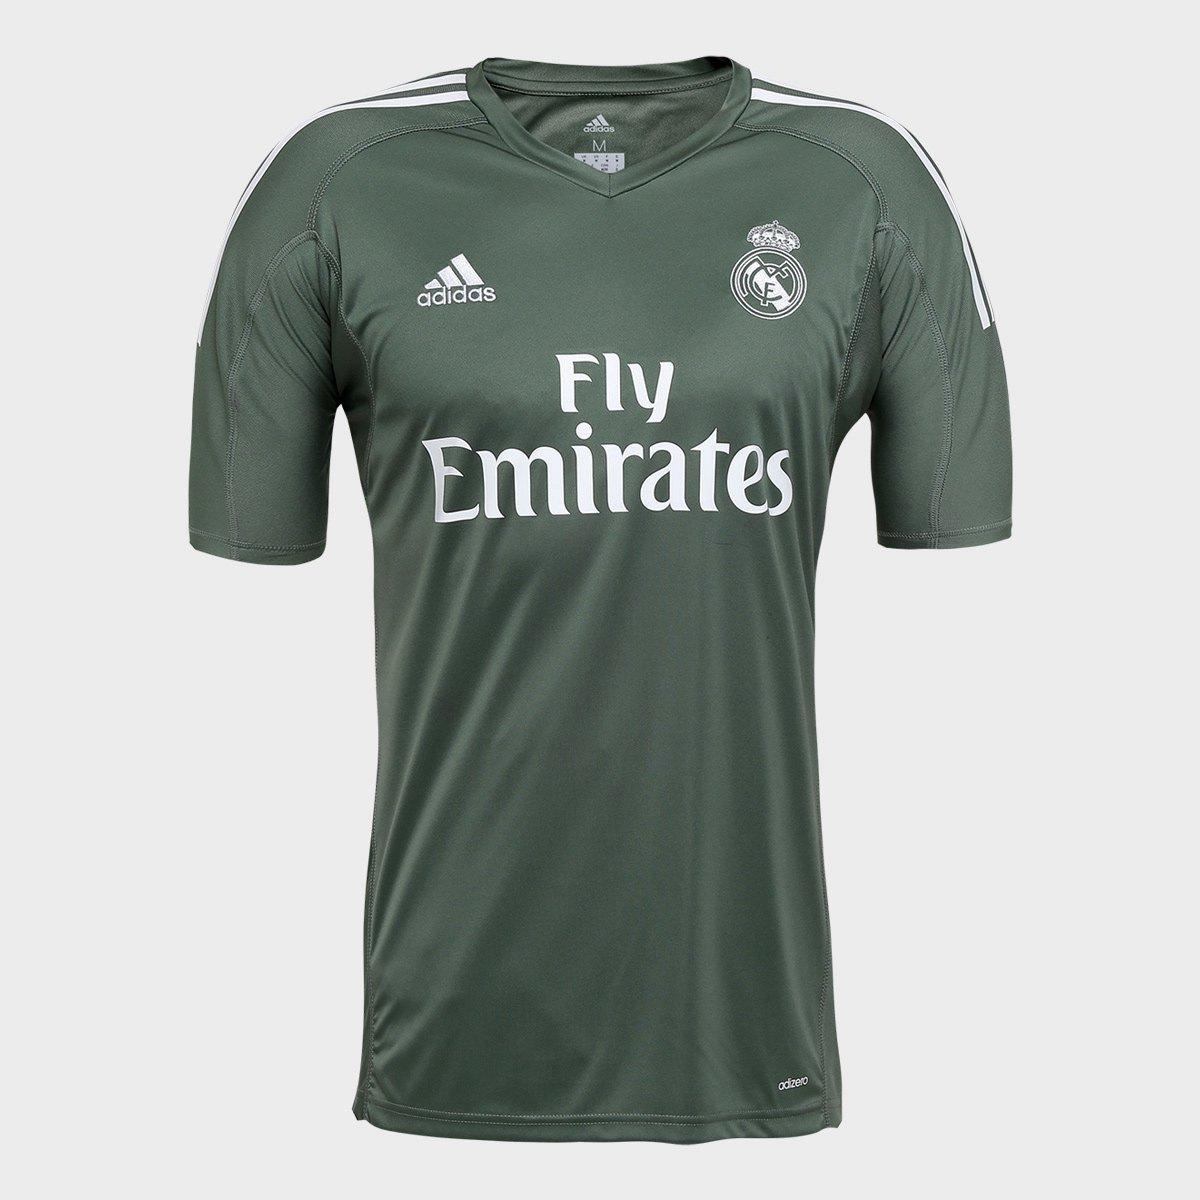 Camisa Real Madrid Goleiro 17 18 - Torcedor Adidas Masculina 75d3ee335a6f6